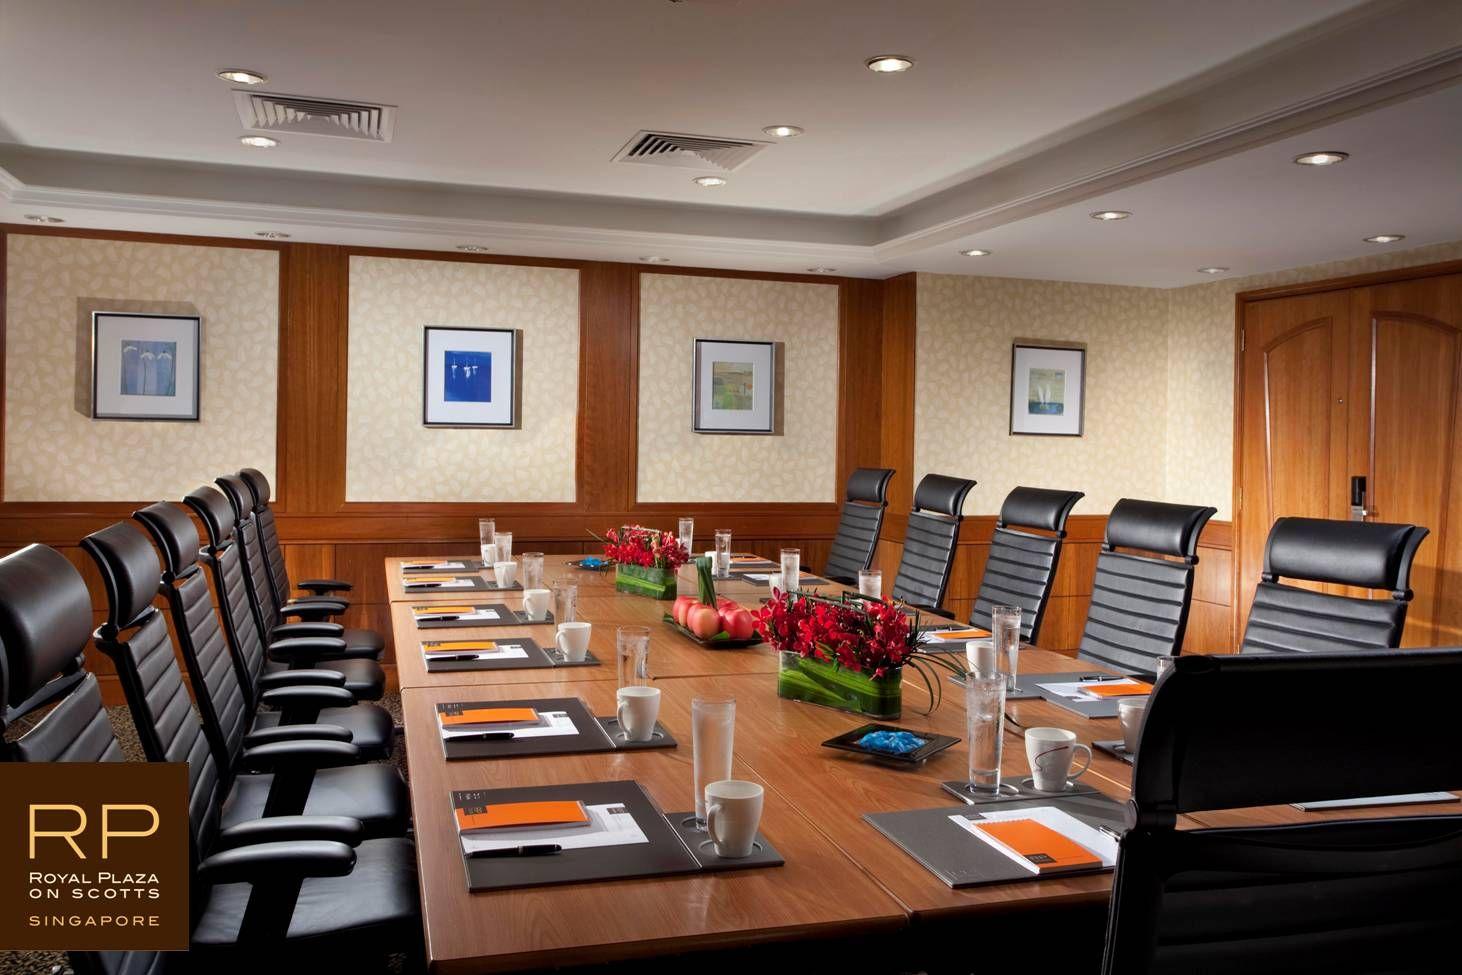 Meeting room scotts room singapore hotels room royal